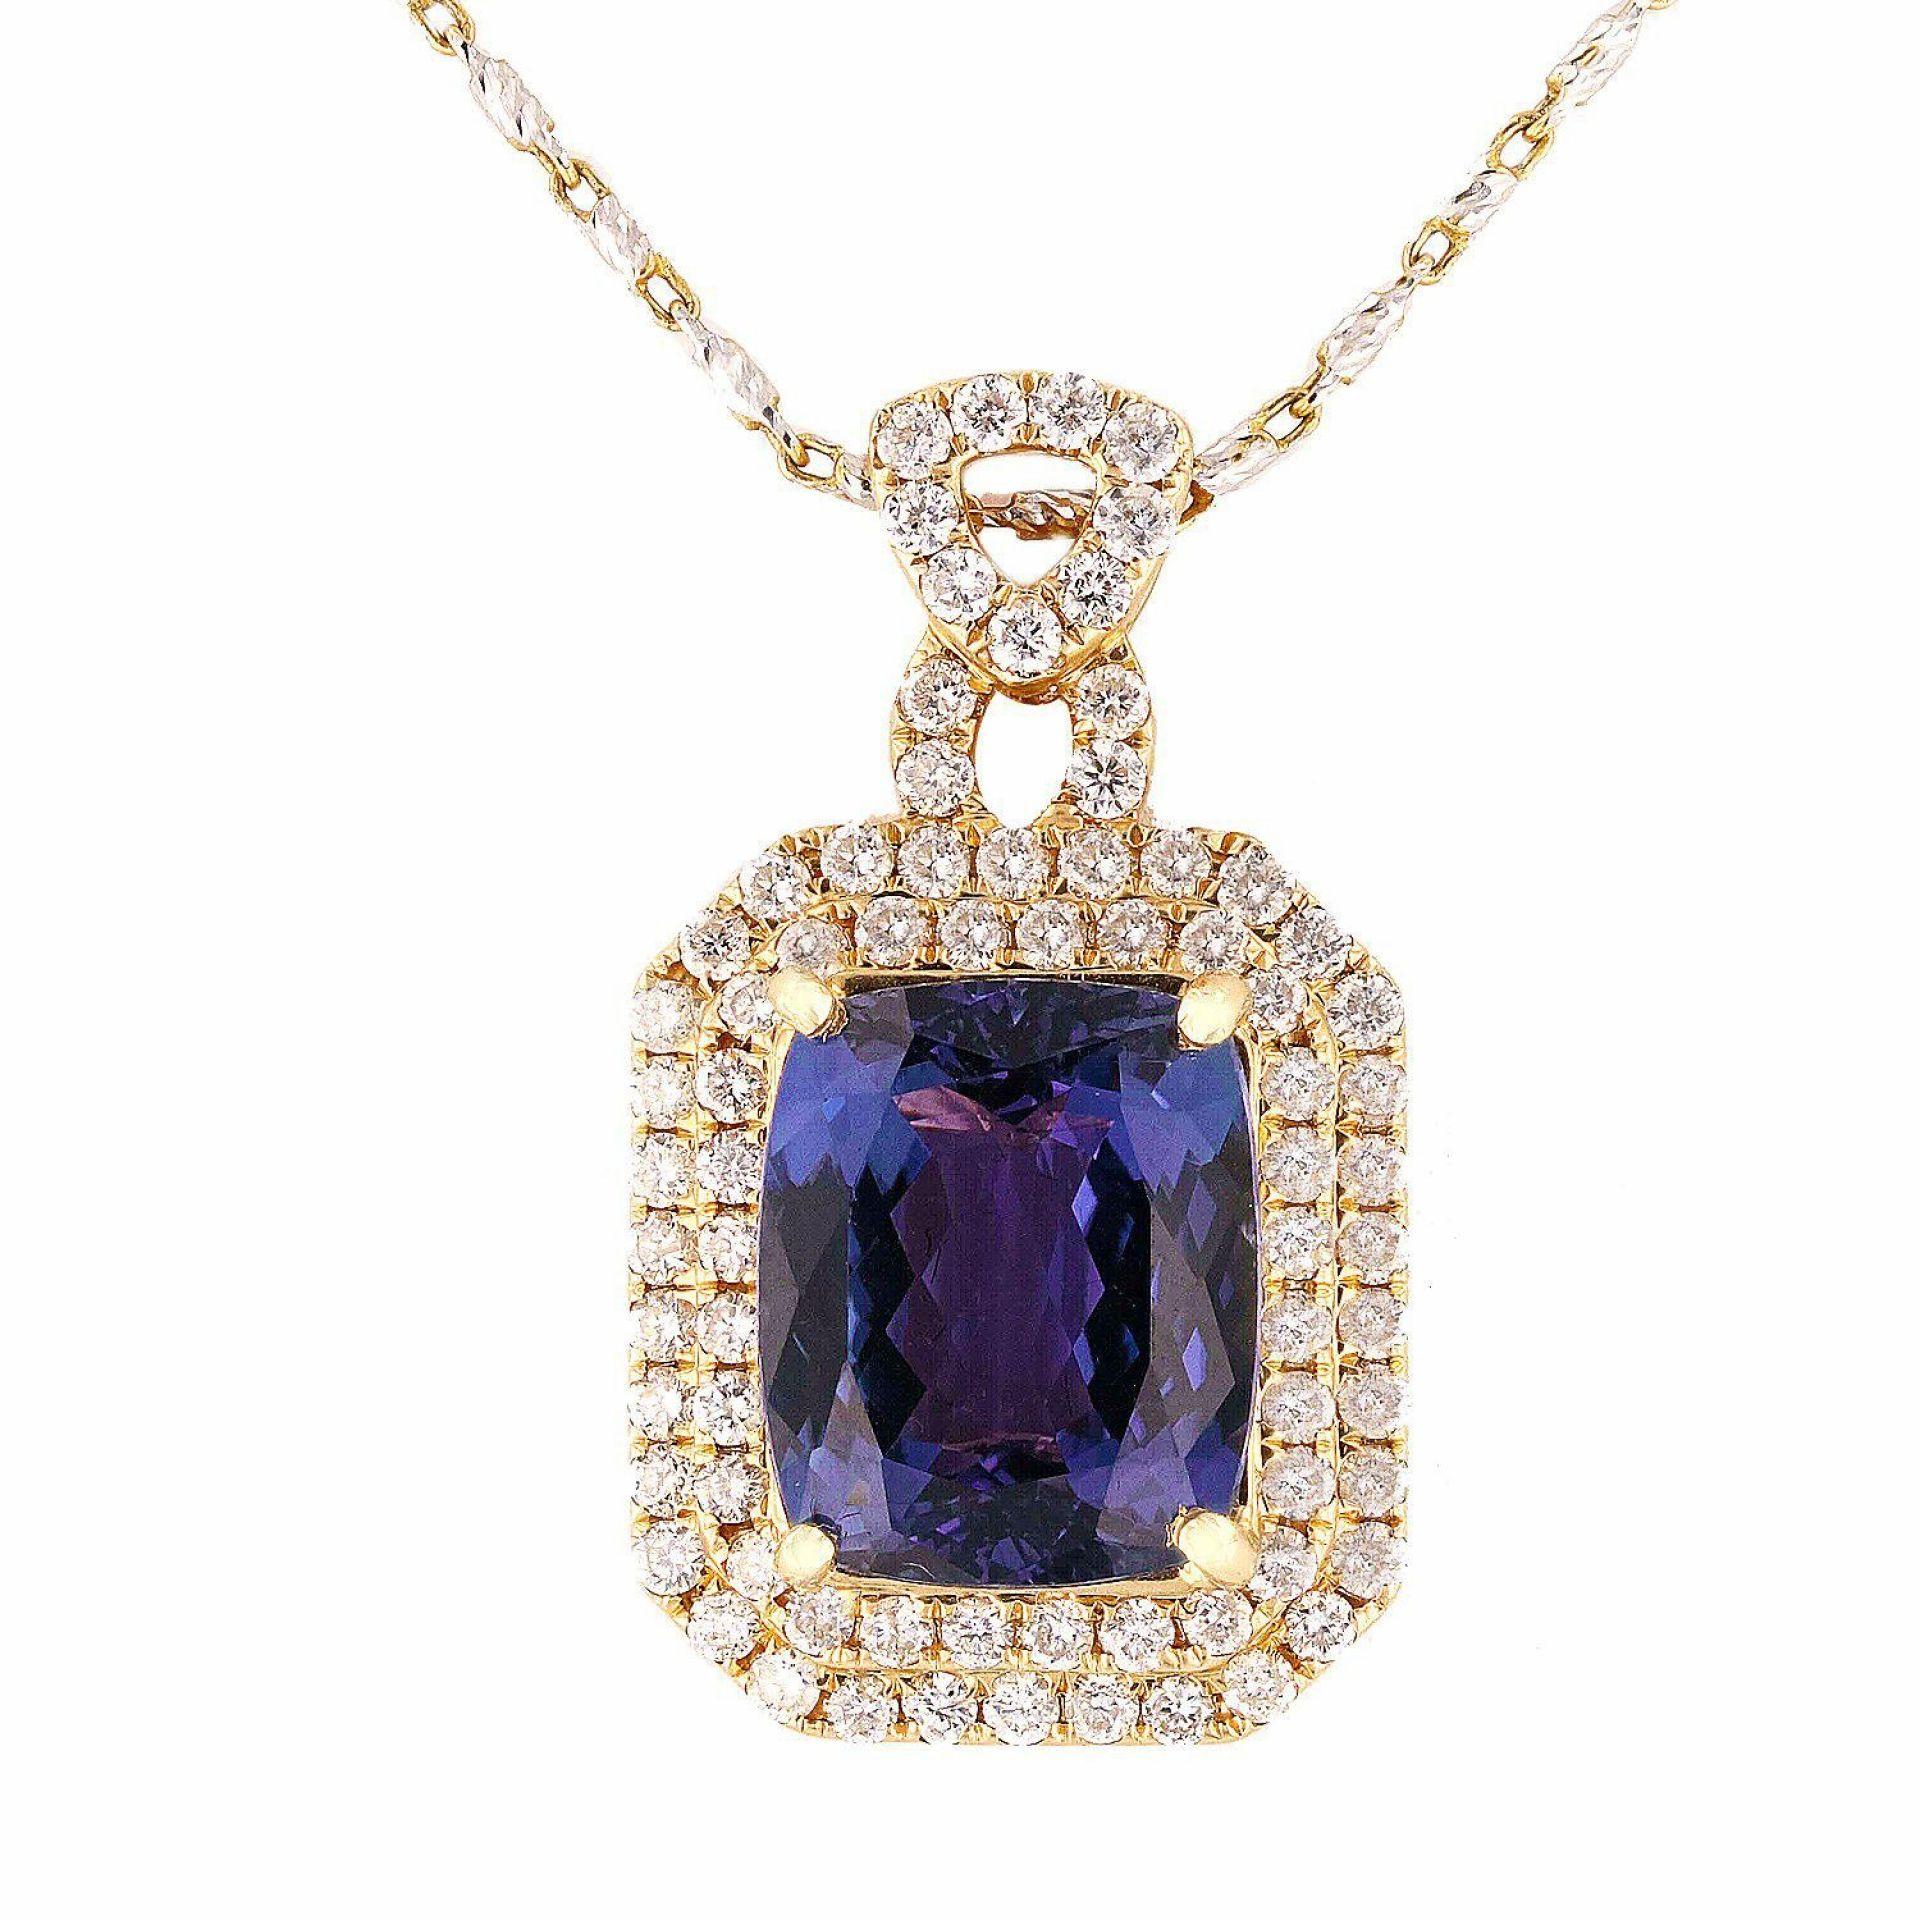 9.23ct Tanzanite and 1.44ctw Diamond 14K White Gold Pendant/Necklace